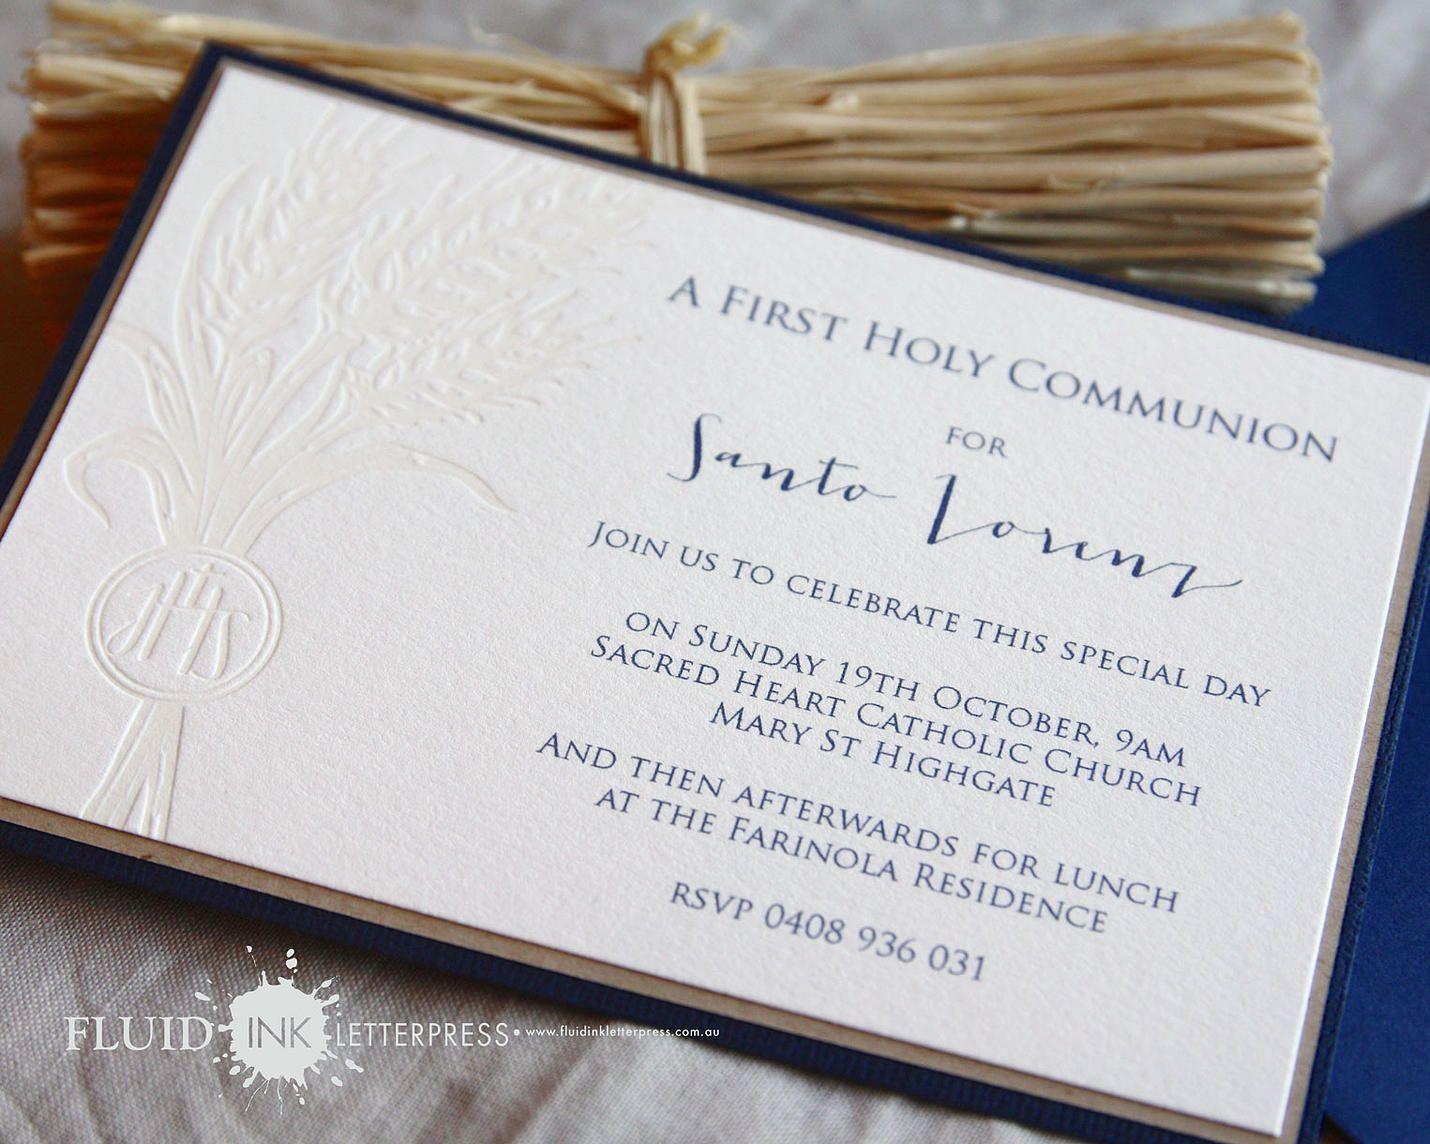 http://www.fluidinkletterpress.com.au/First Holy Communion ...